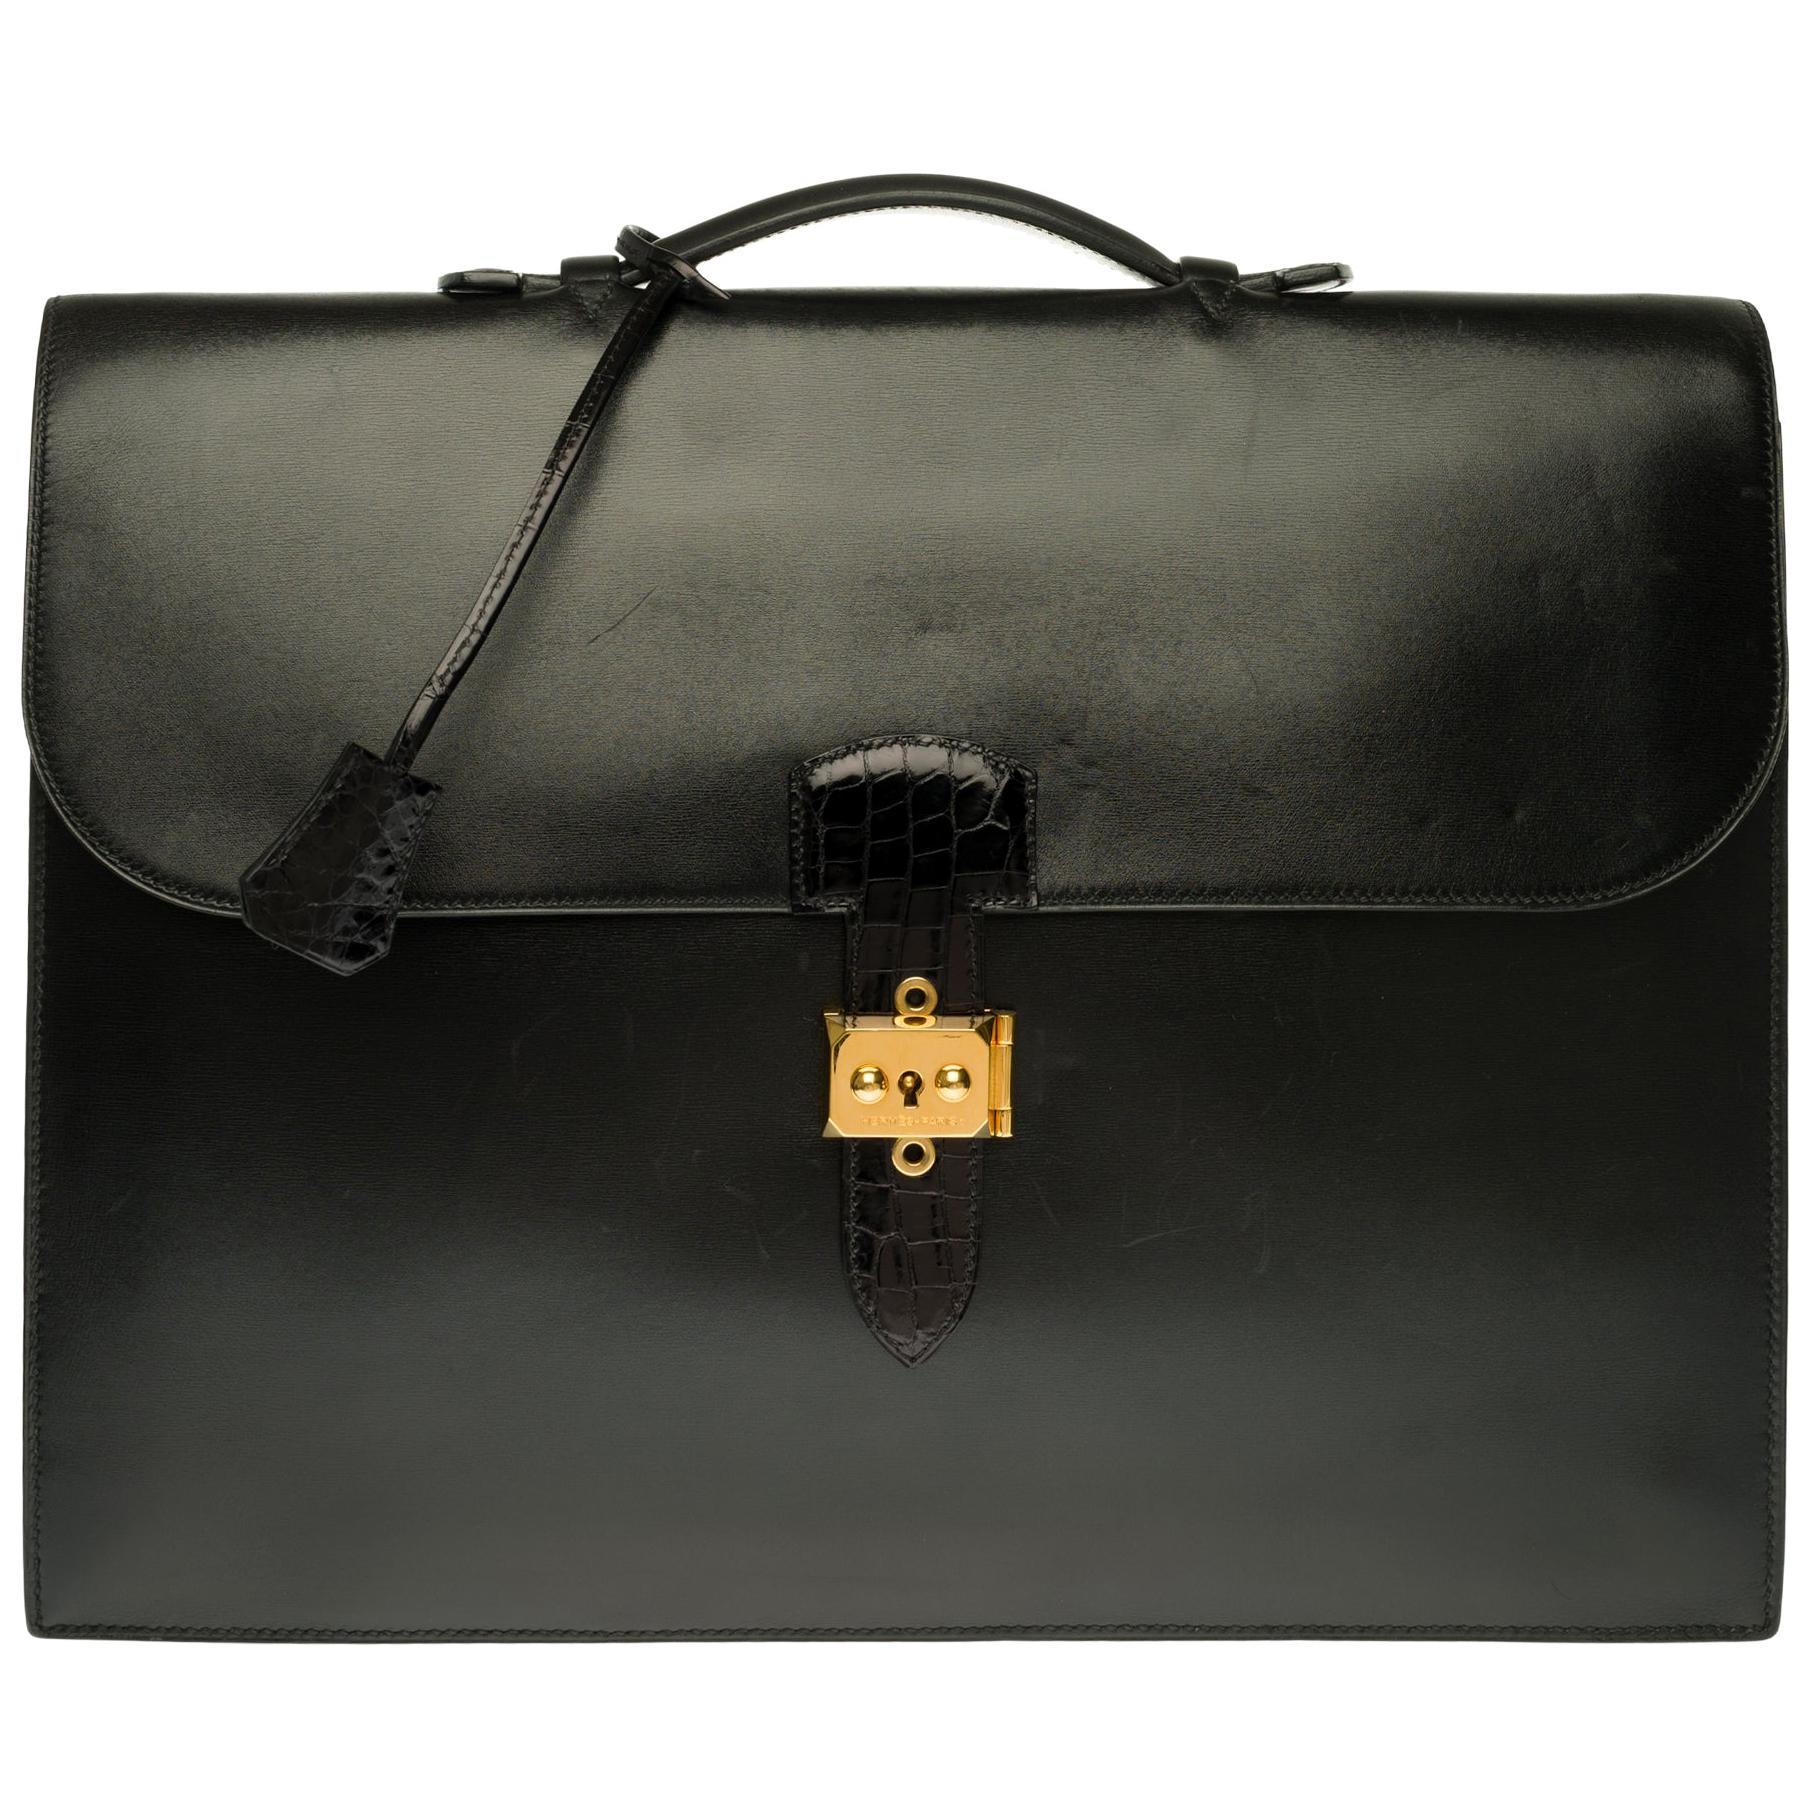 Customized Hermès Sac à dépêches briefcase in black calf and crocodile leather